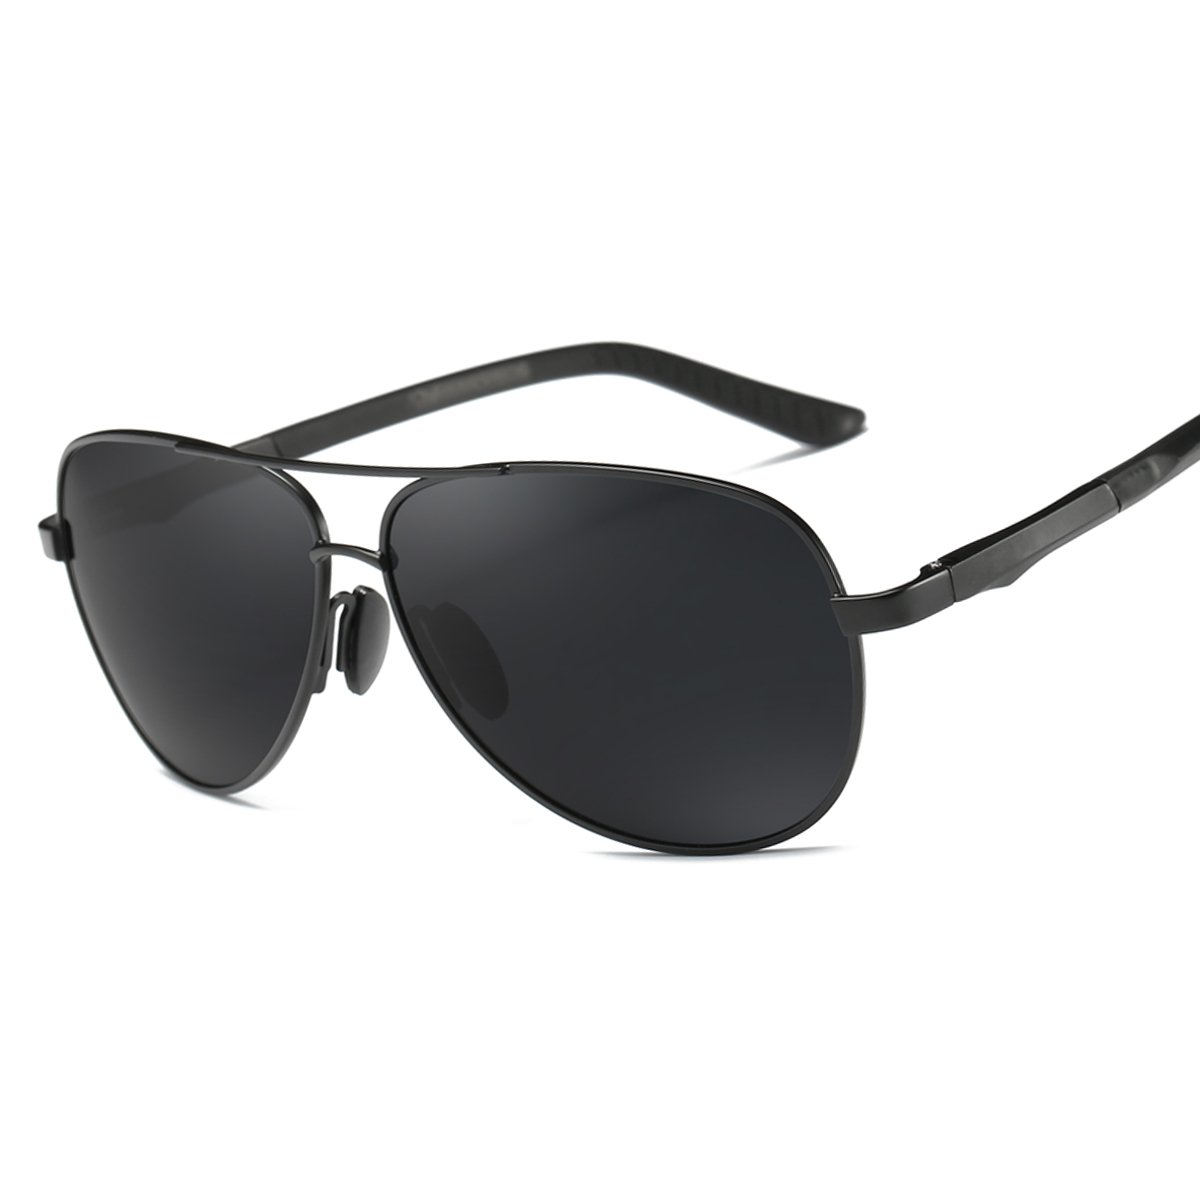 ELITERA Men/Women Polarized Sunglasses Aluminum Magnesium Alloy E210 (BLACK&GRAY, 65)